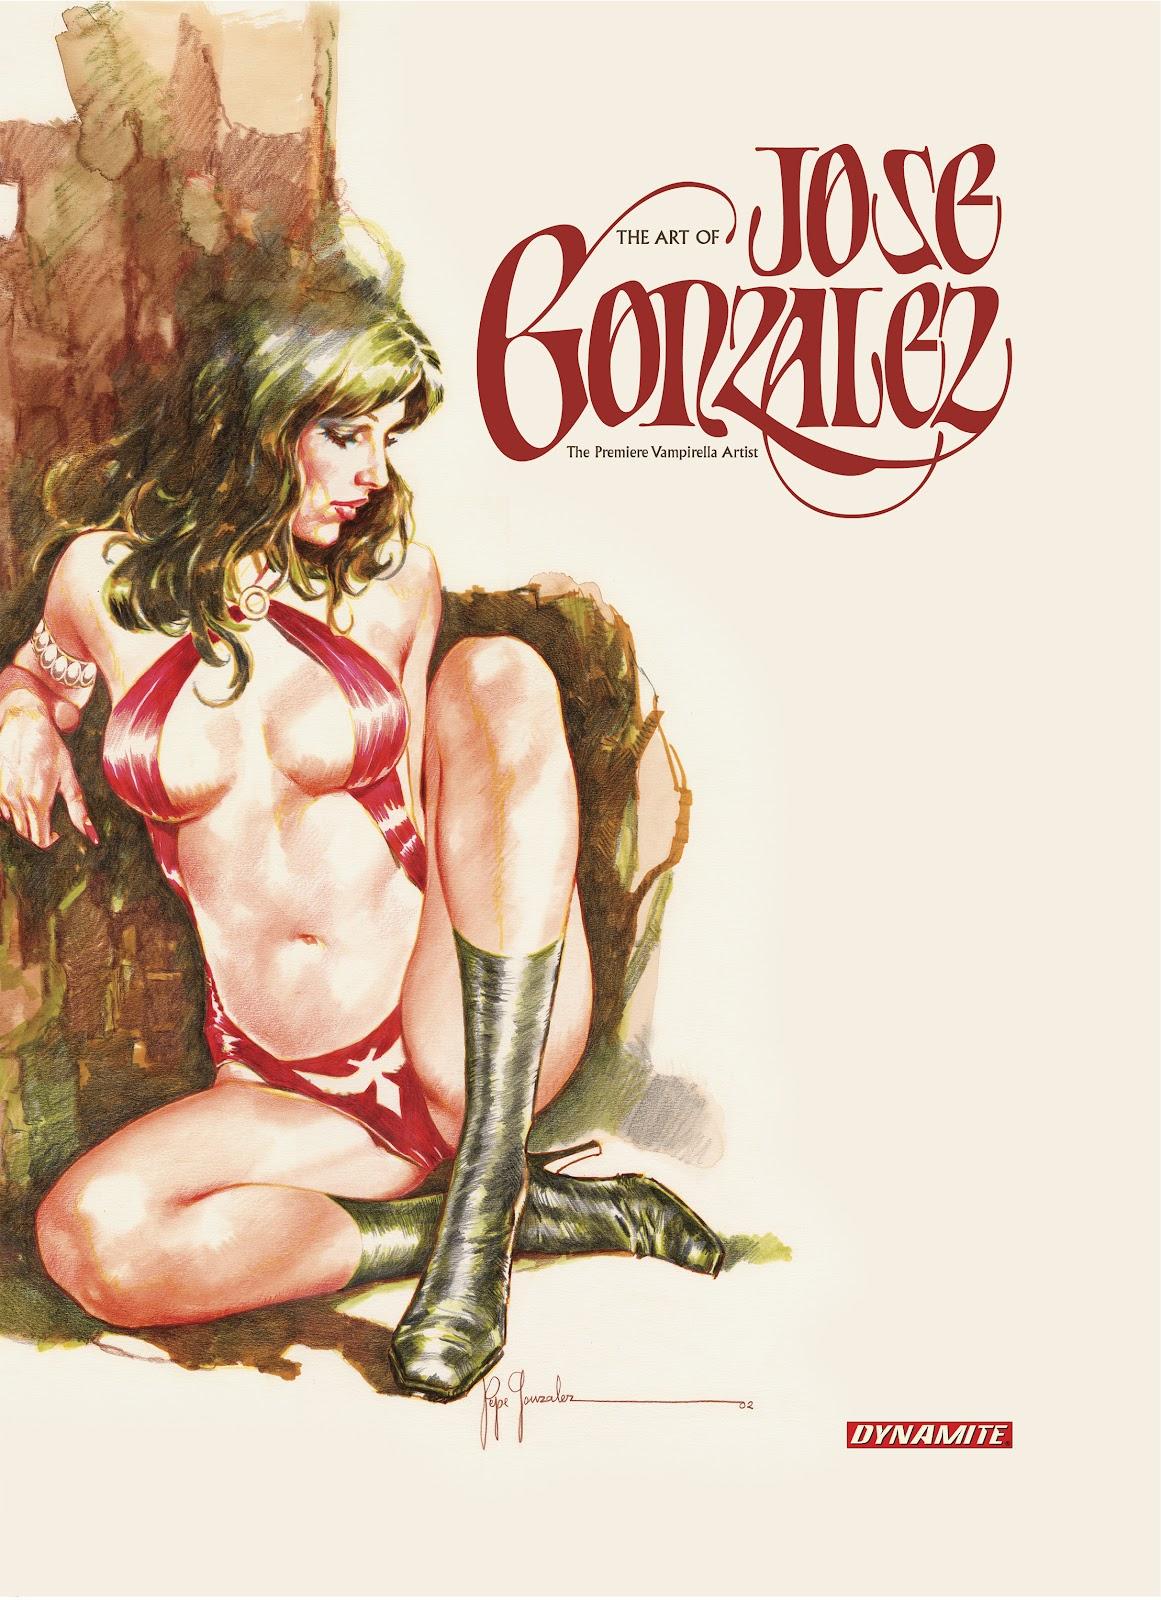 Read online The Art of Jose Gonzalez comic -  Issue # TPB (Part 1) - 1